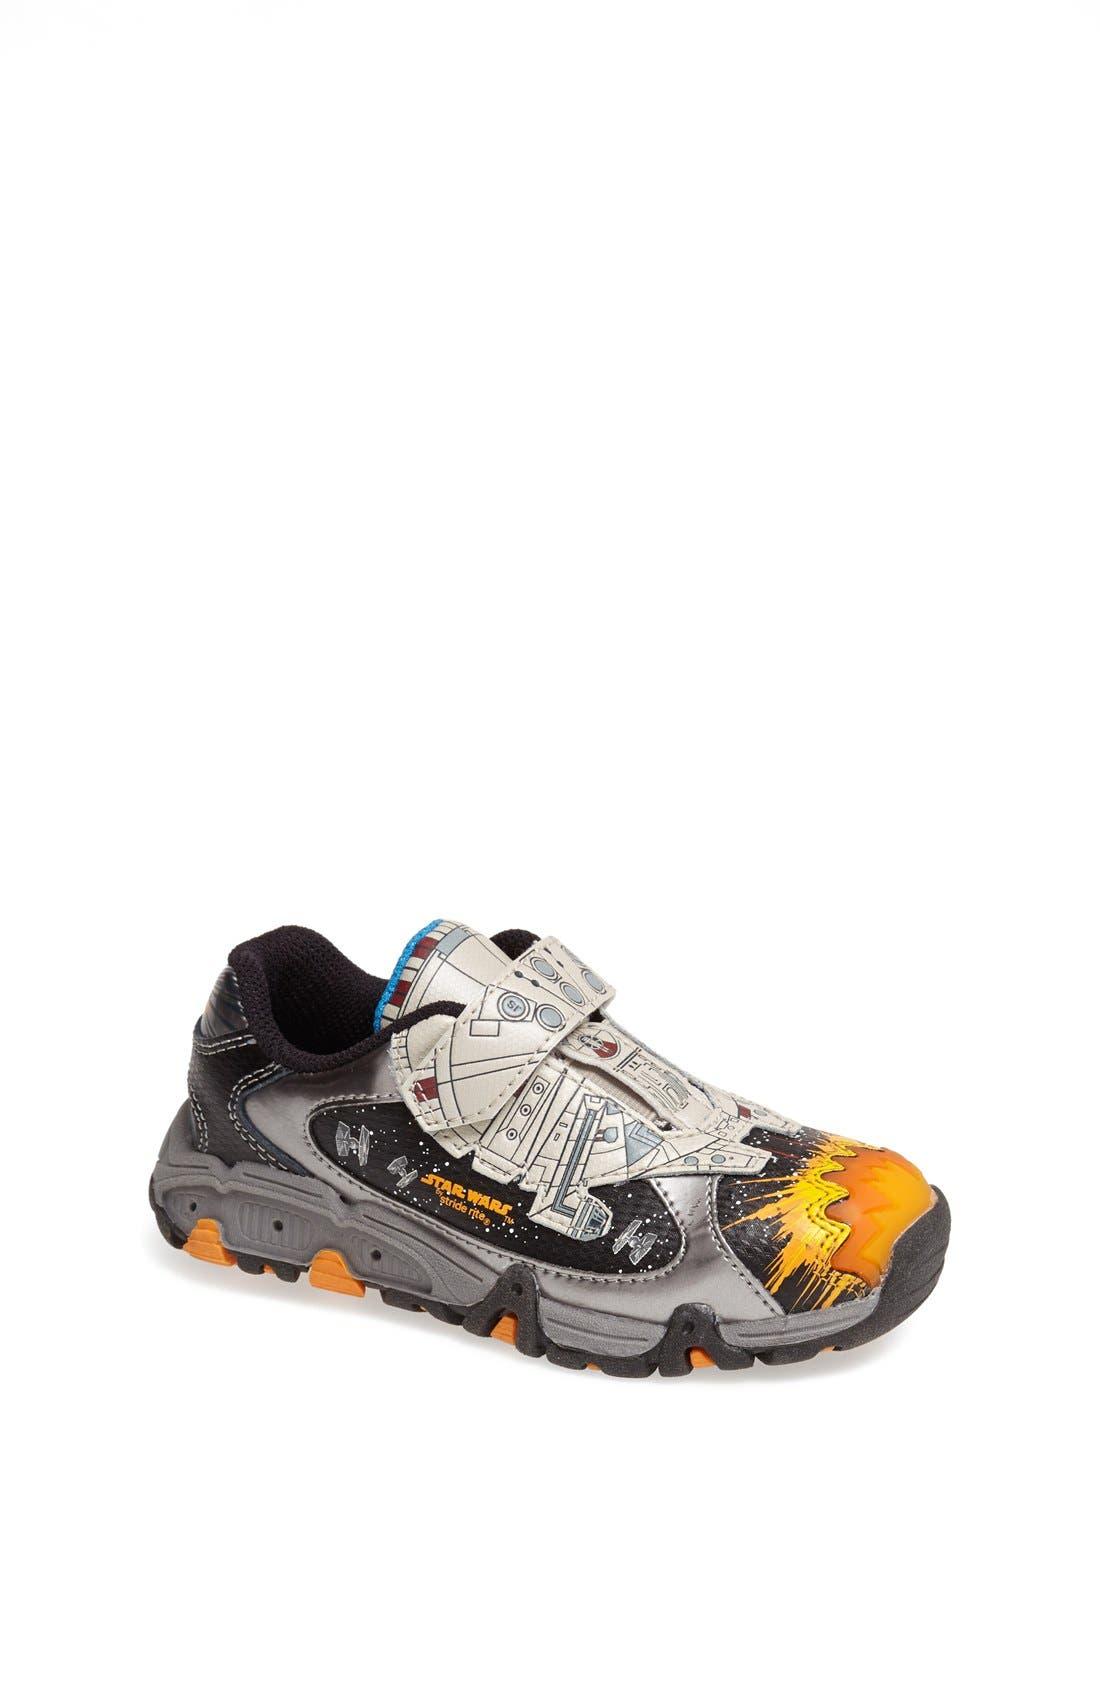 Main Image - Stride Rite 'Star Wars™  - Millenium Falcon™' Light-Up Sneaker (Toddler & Little Kid)